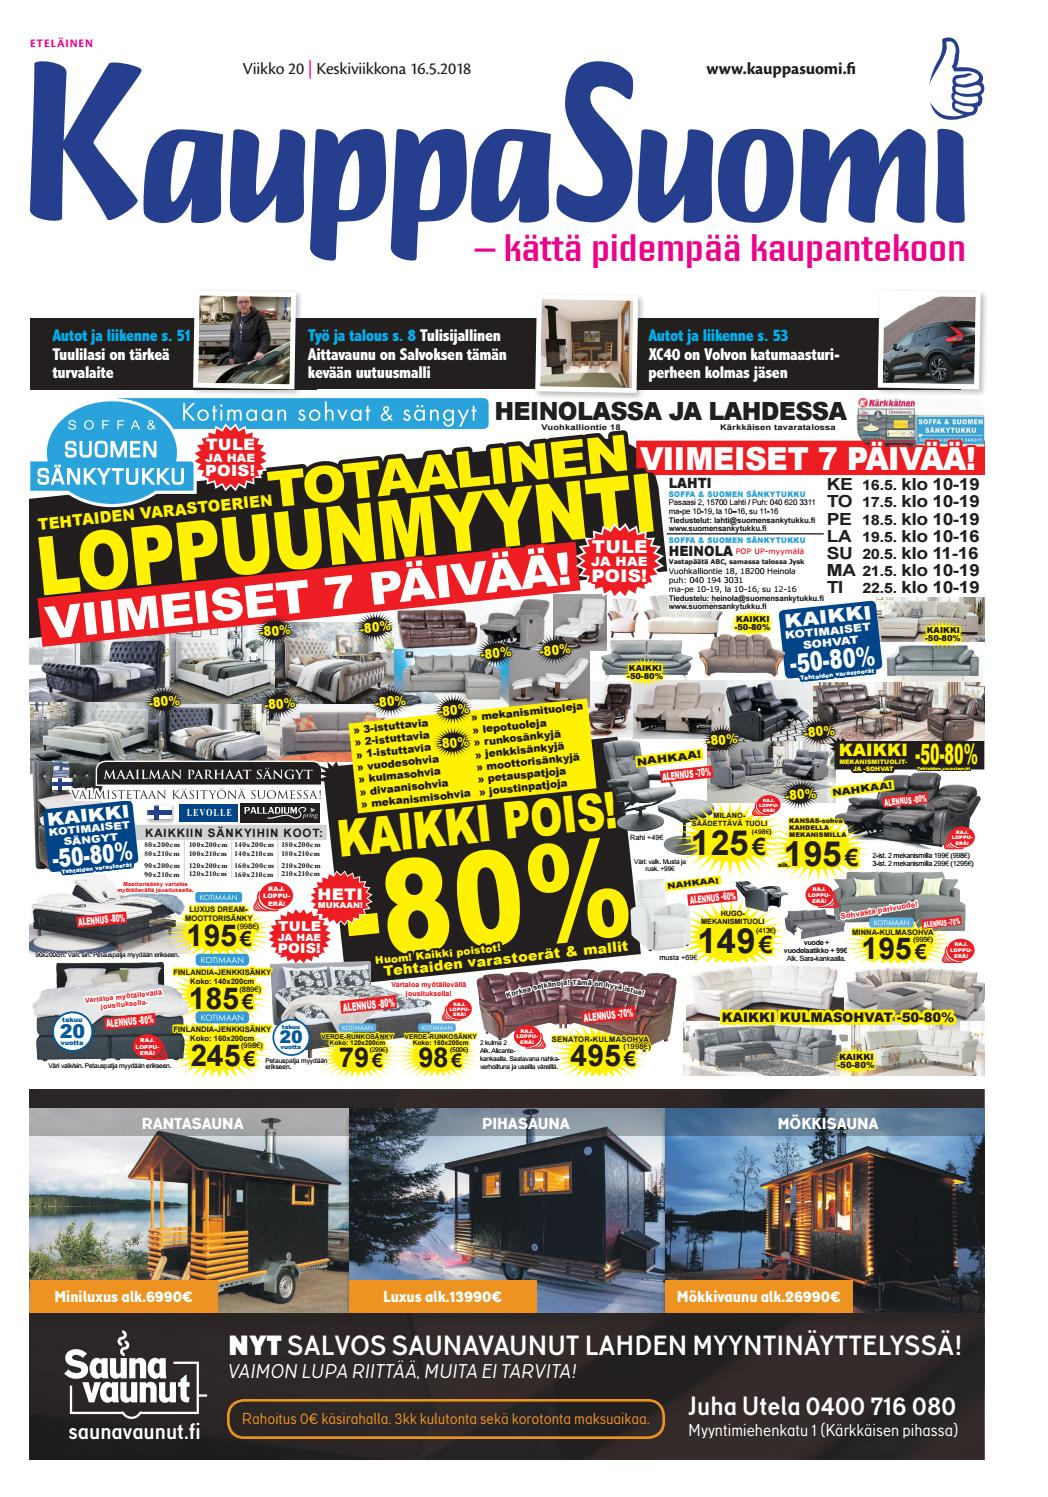 watch 87350 75512 KauppaSuomi 20 2018 (E) by KauppaSuomi - issuu